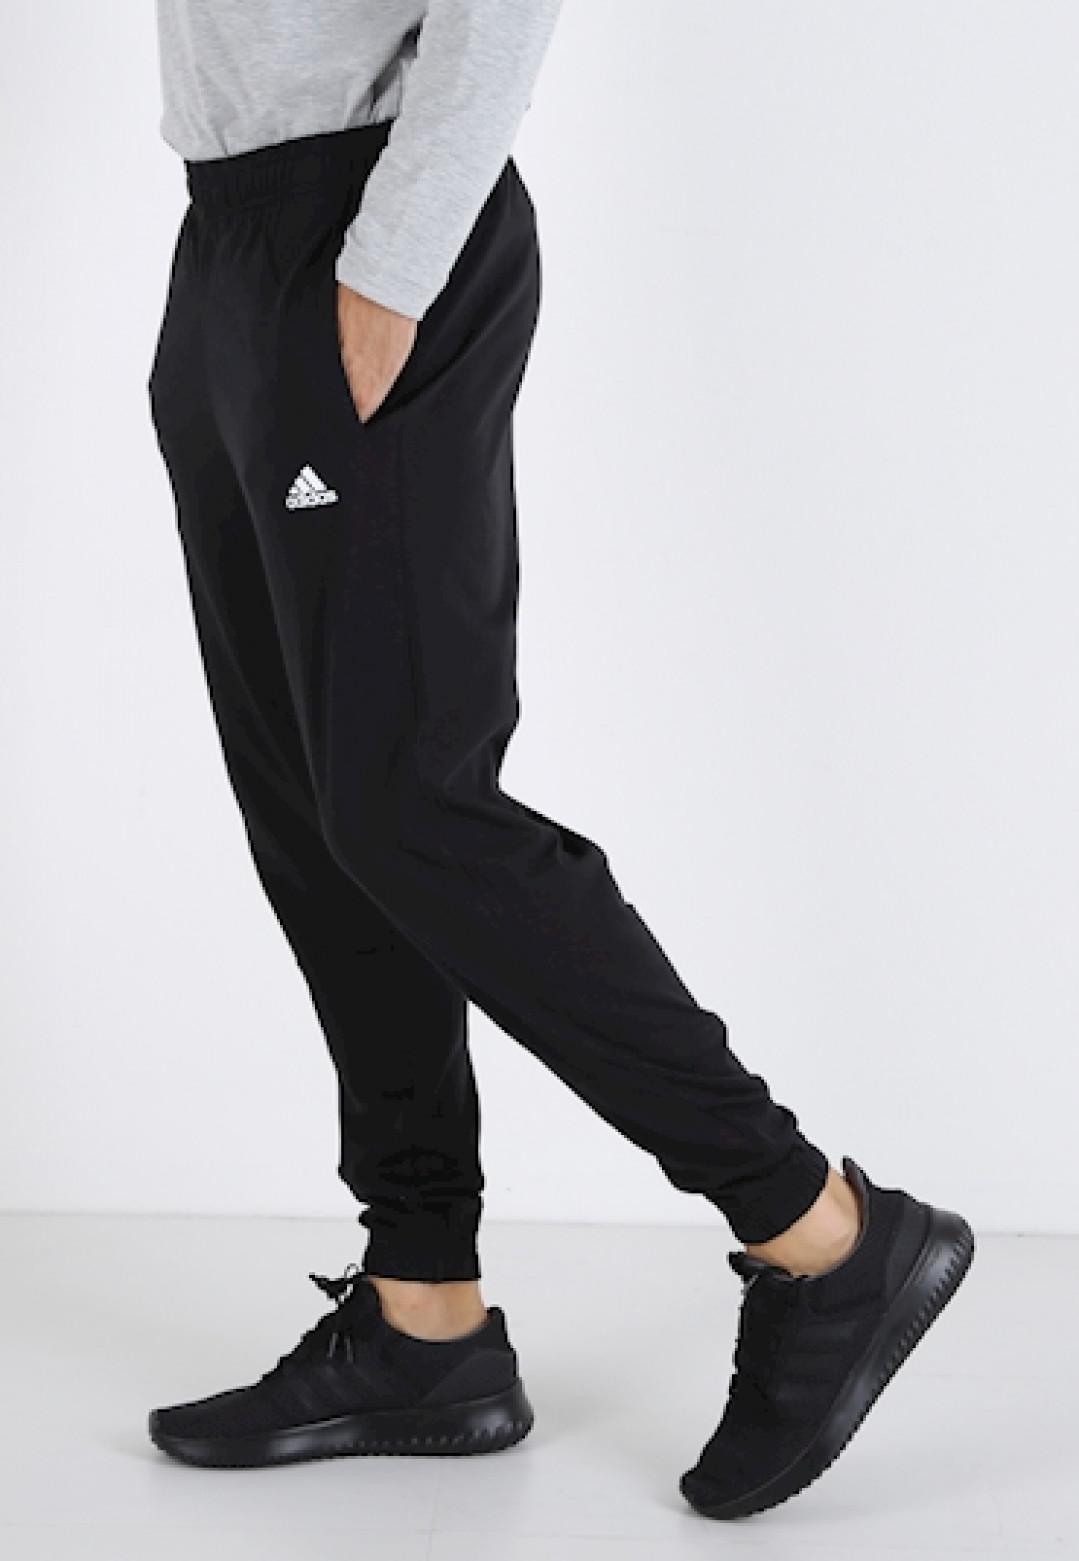 adidas pantaloni donna leggeri